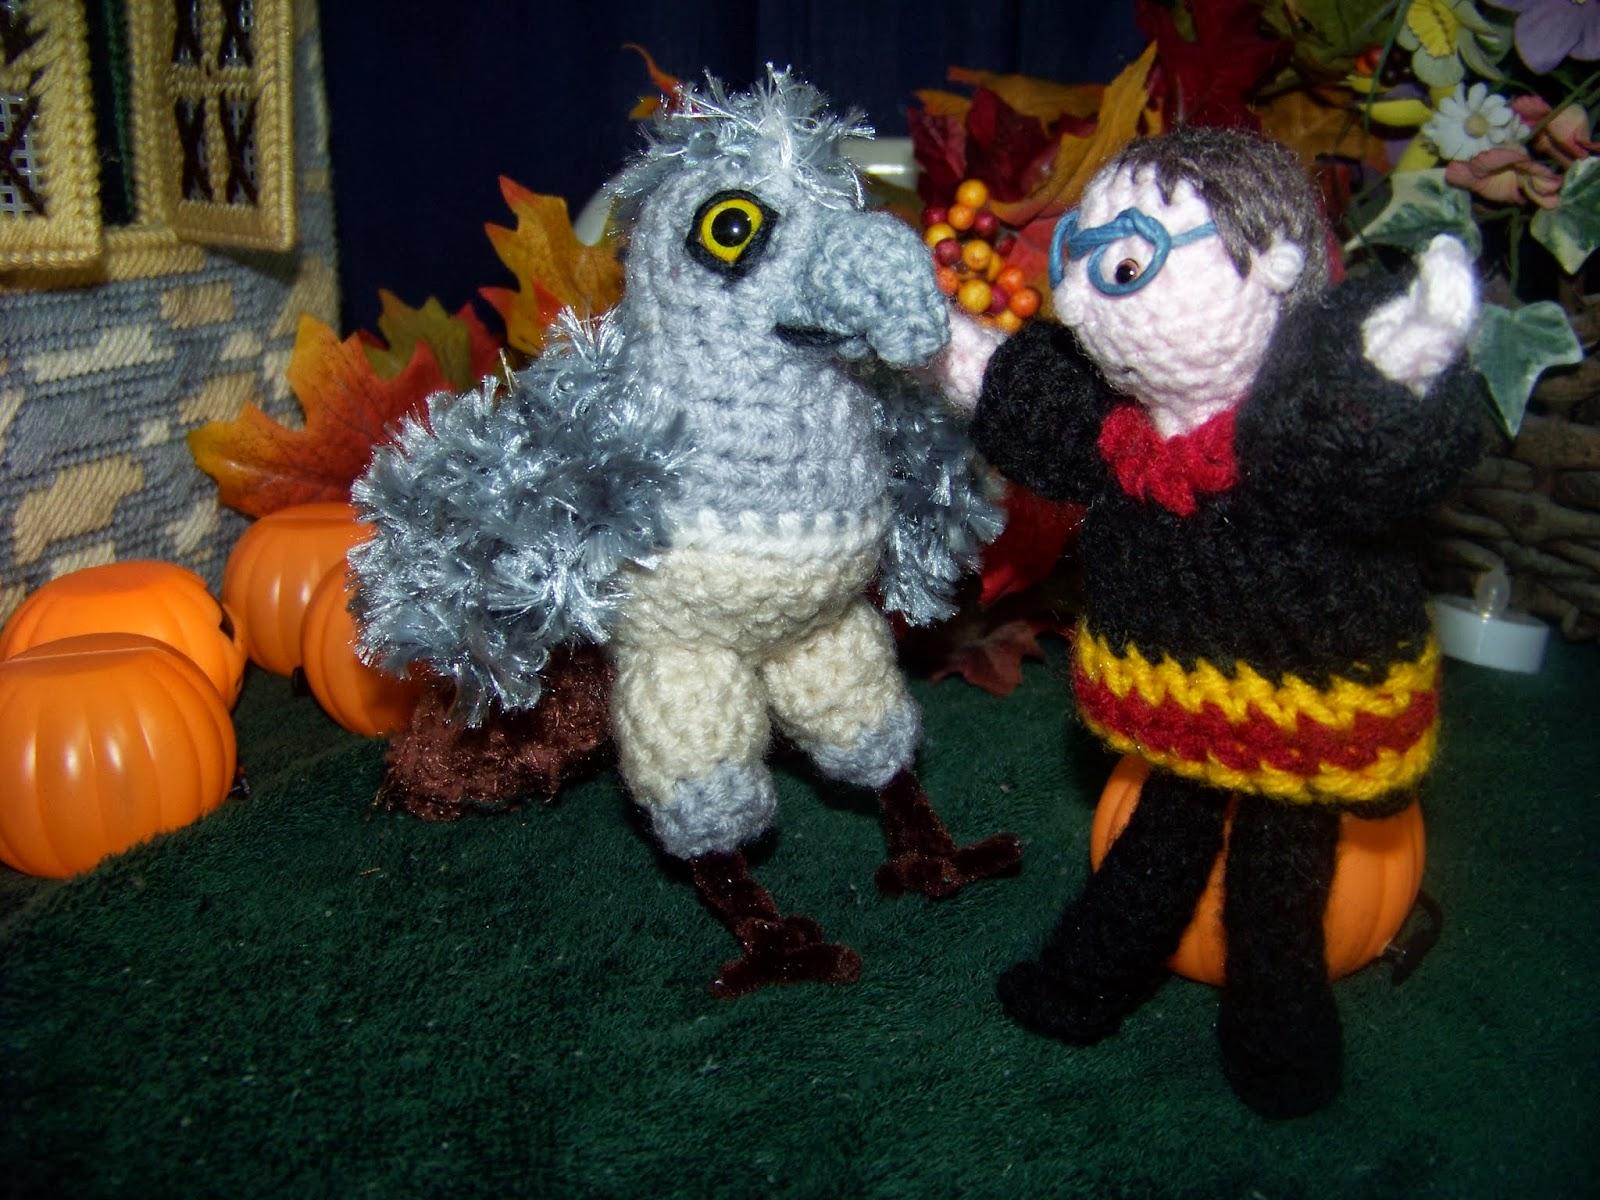 Crafty Kat: Baby Hippogriff crochet